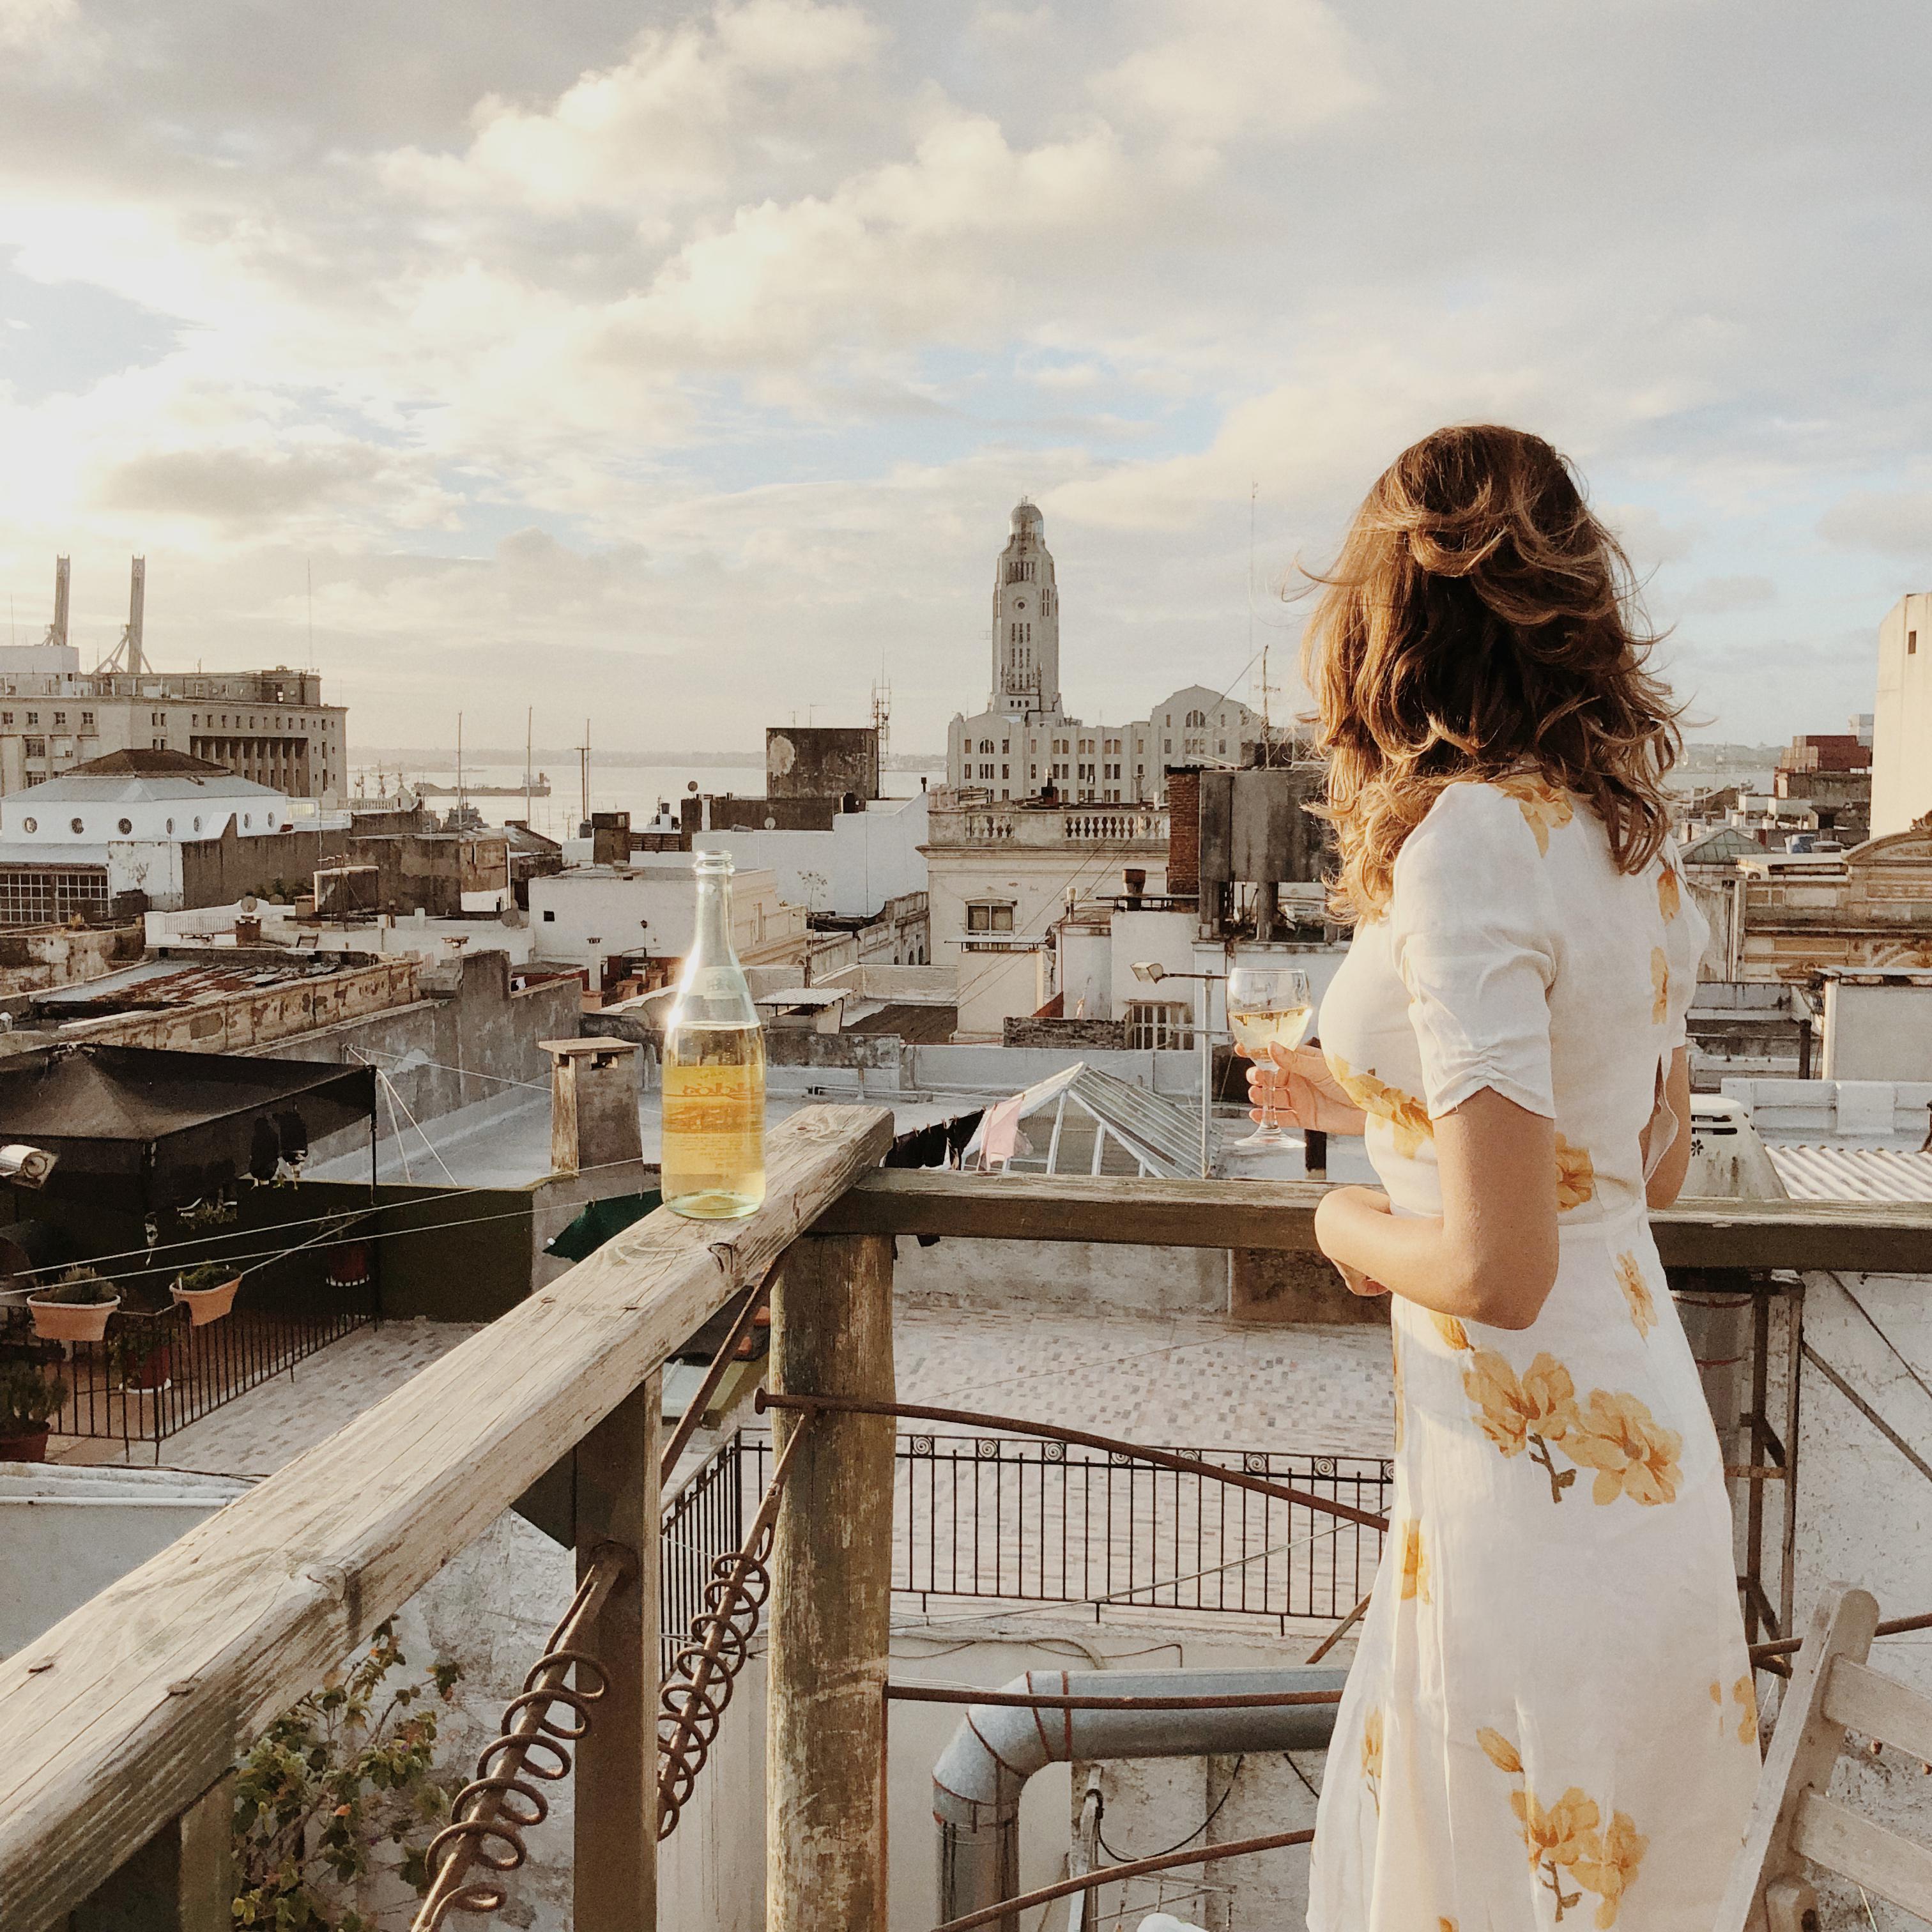 Montevideo, Uruguay: Photographer Luisa Dörr's dream city